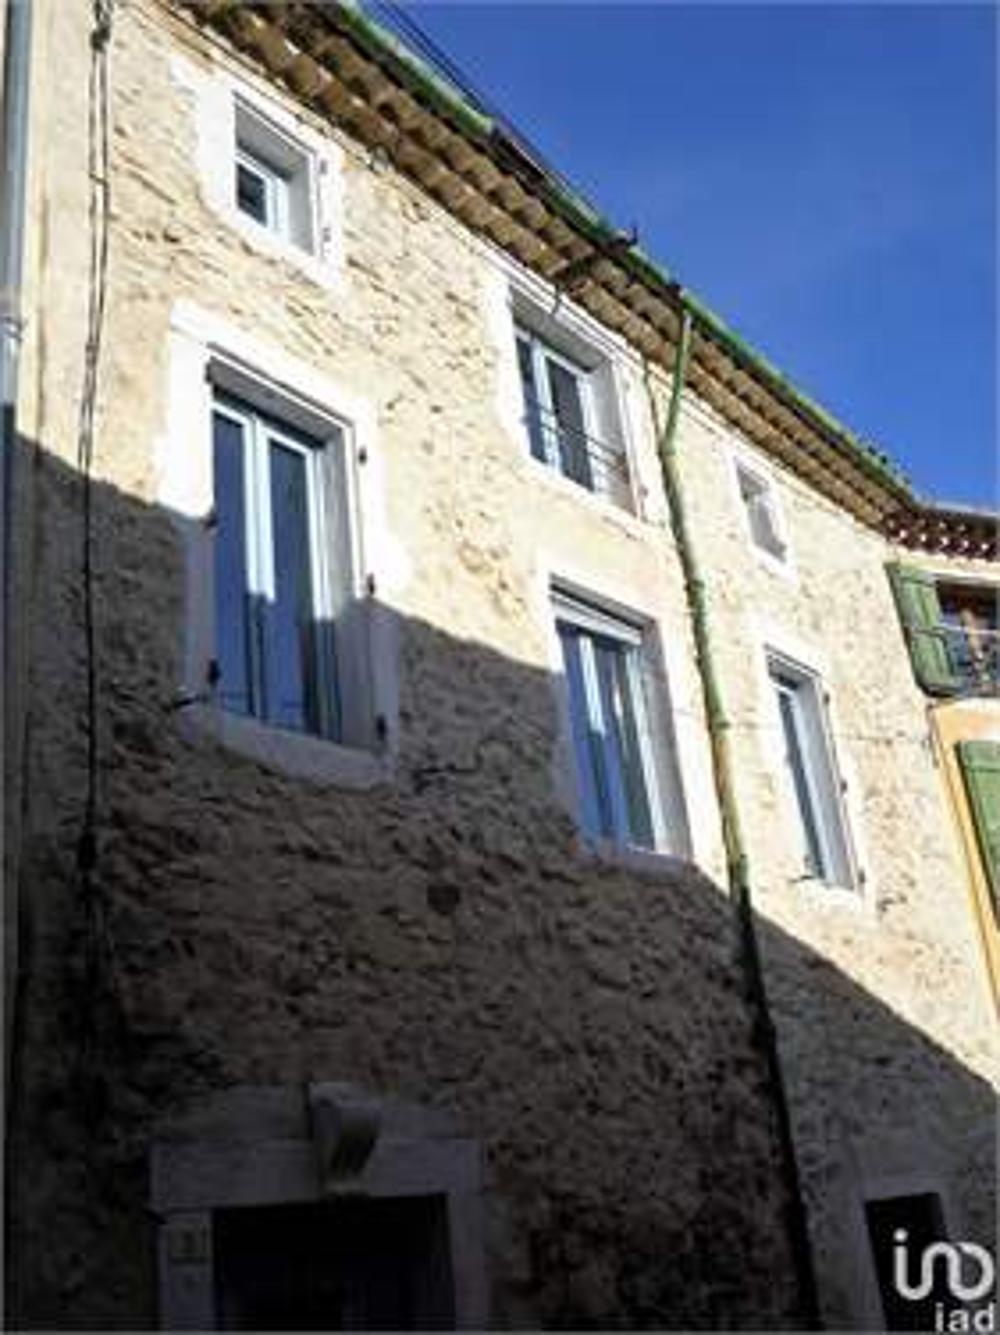 Roquebrun Hérault Apartment Bild 3620874